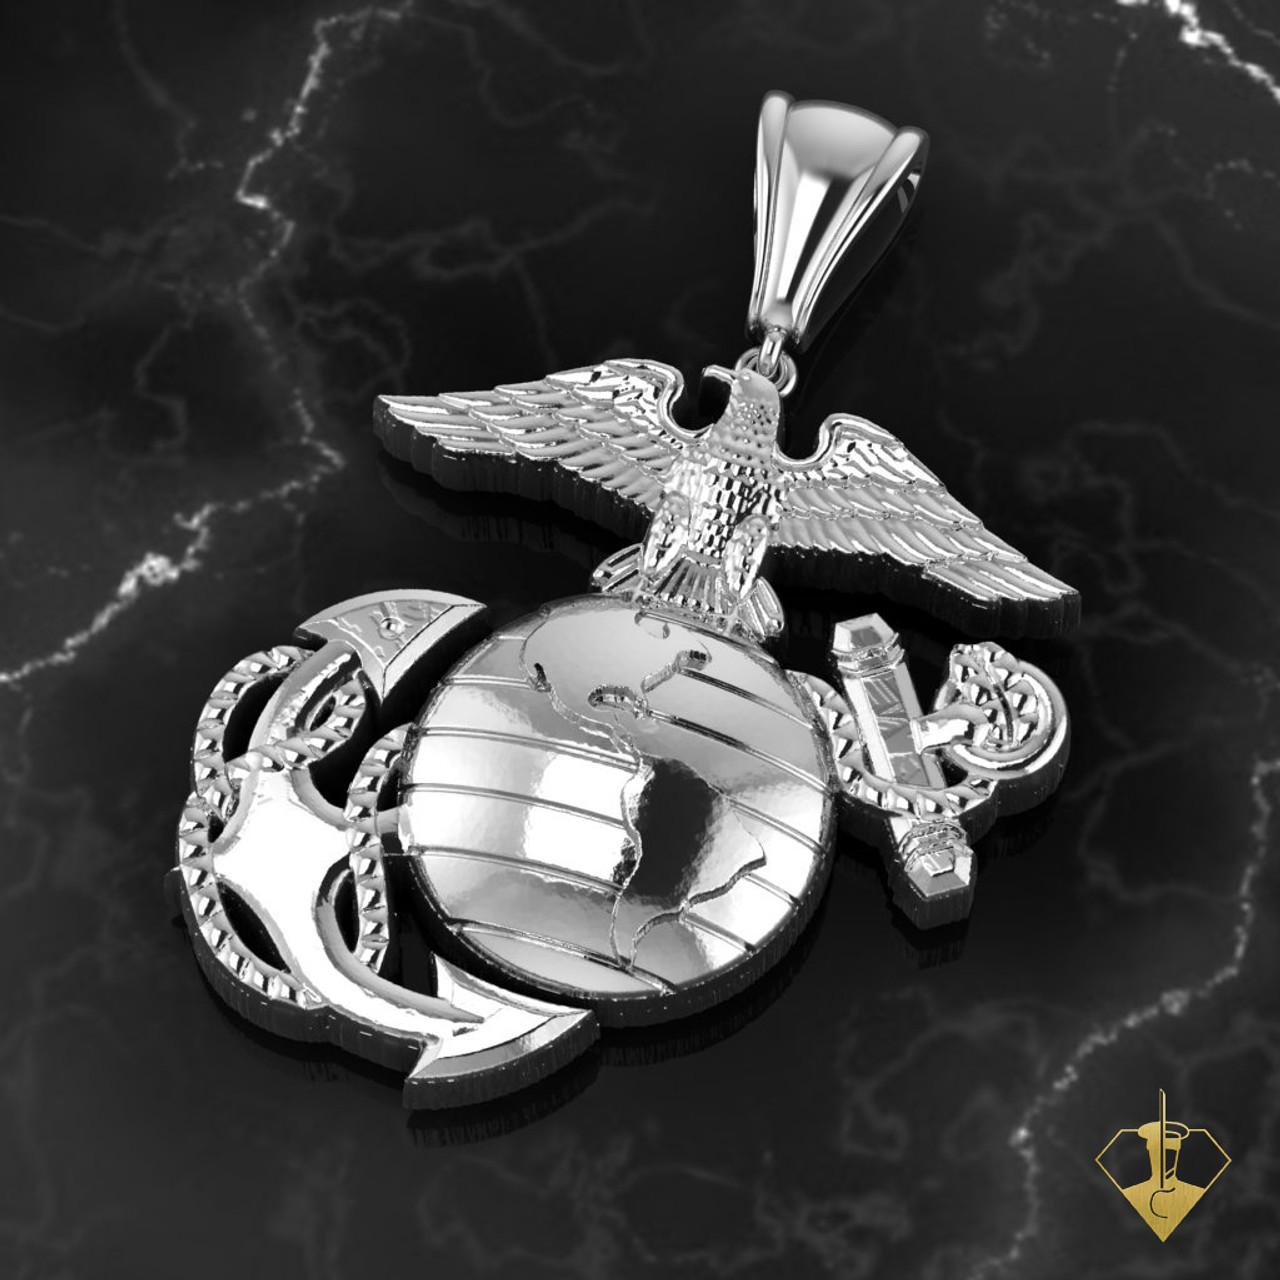 USMC Marine Solid  Belt Buckle Rope /& Anchors Insignia